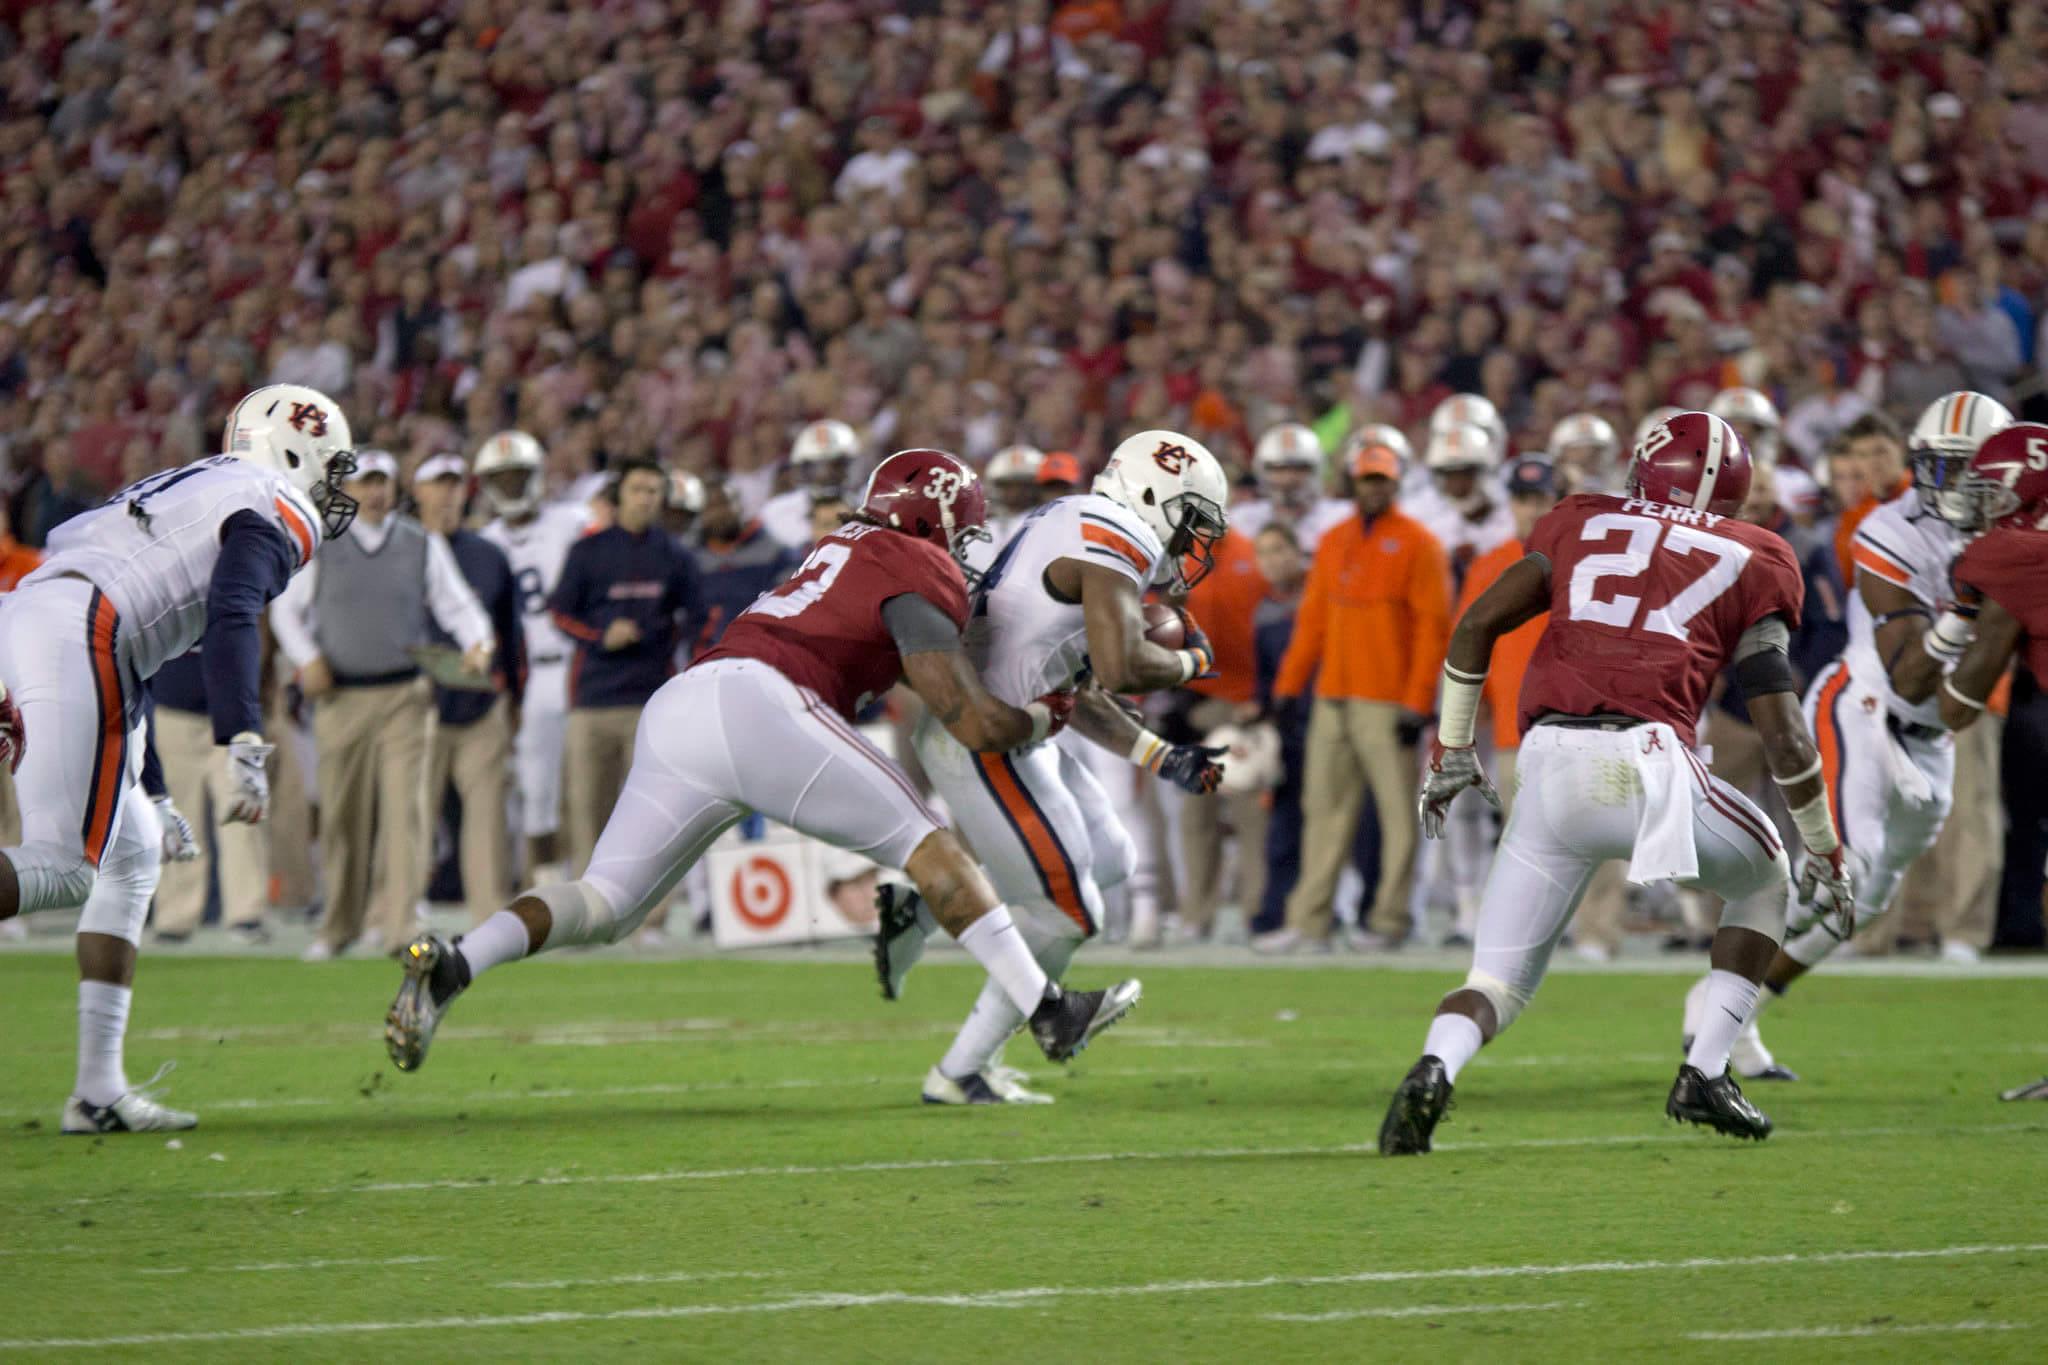 Alabama Crimson Tide vs Auburn Tigers NCAAF football rivalry